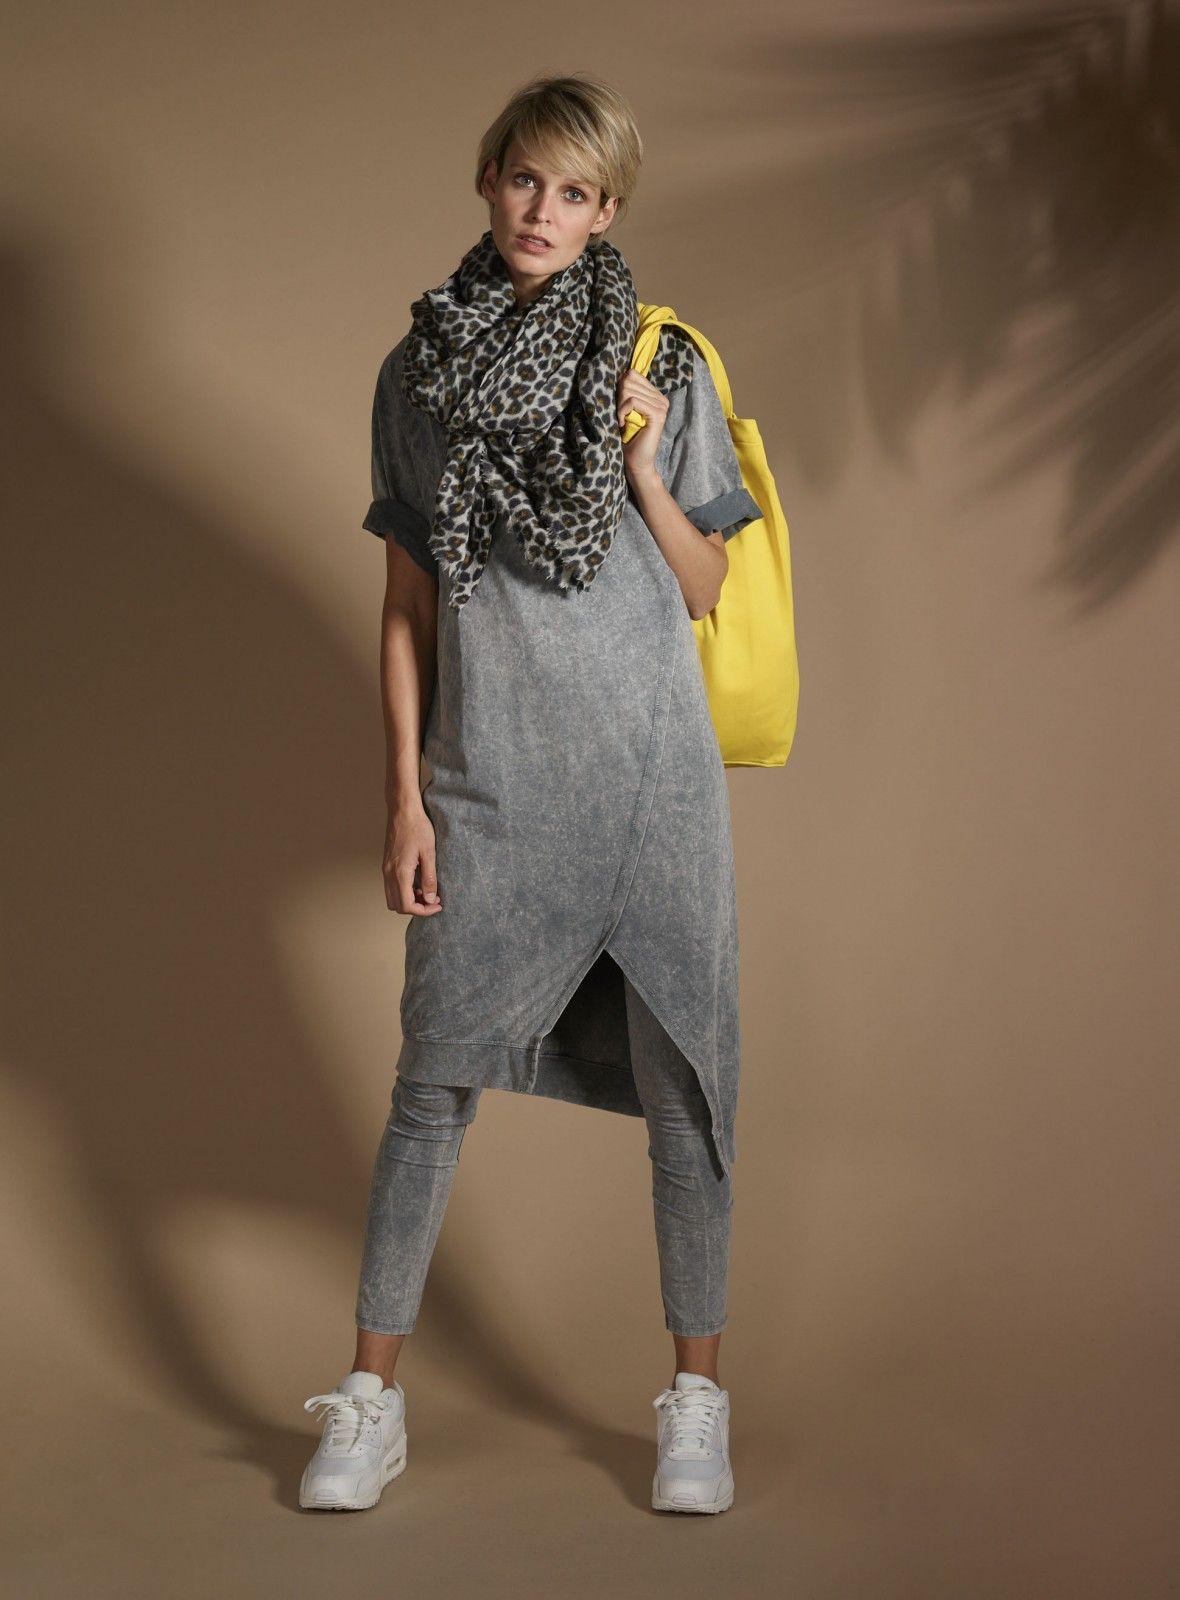 10 DaysBoho Moda Ropa Asymmetrical Love UrbanaEn Dress QrxBoWEedC